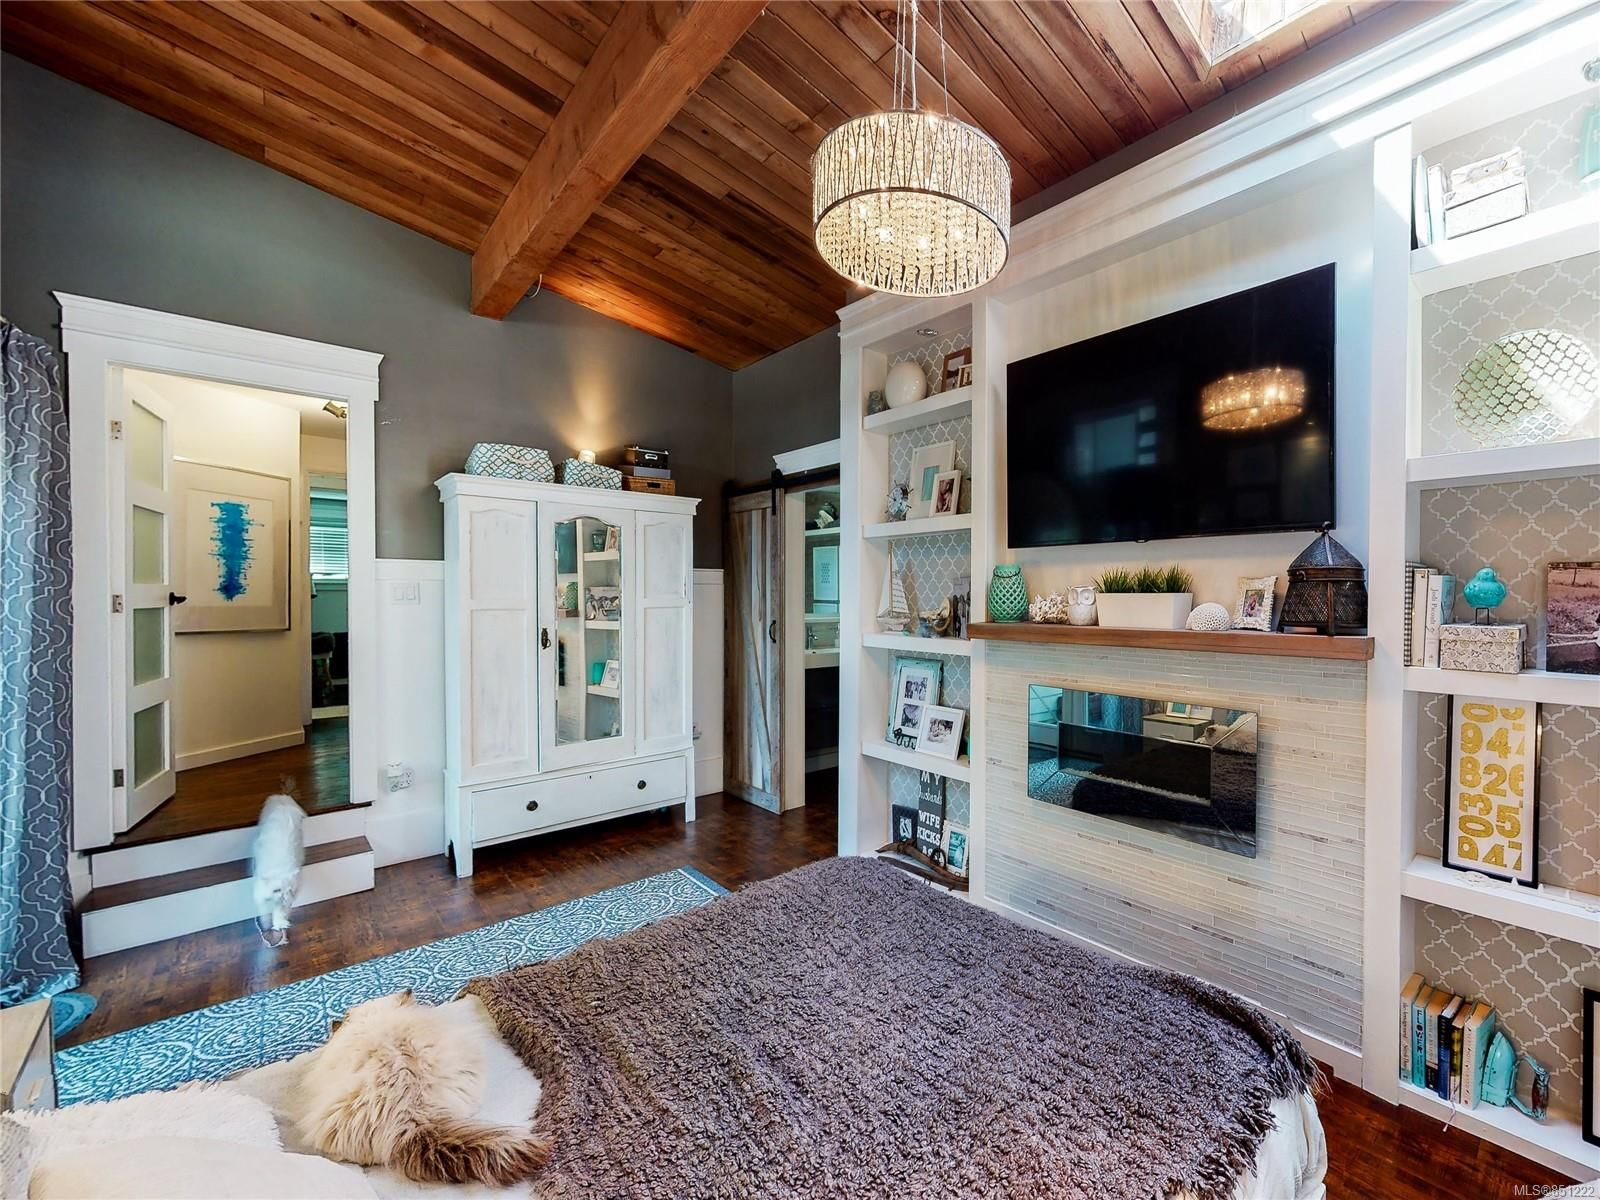 Photo 12: Photos: 2525 11th Ave in : PA Port Alberni House for sale (Port Alberni)  : MLS®# 851222